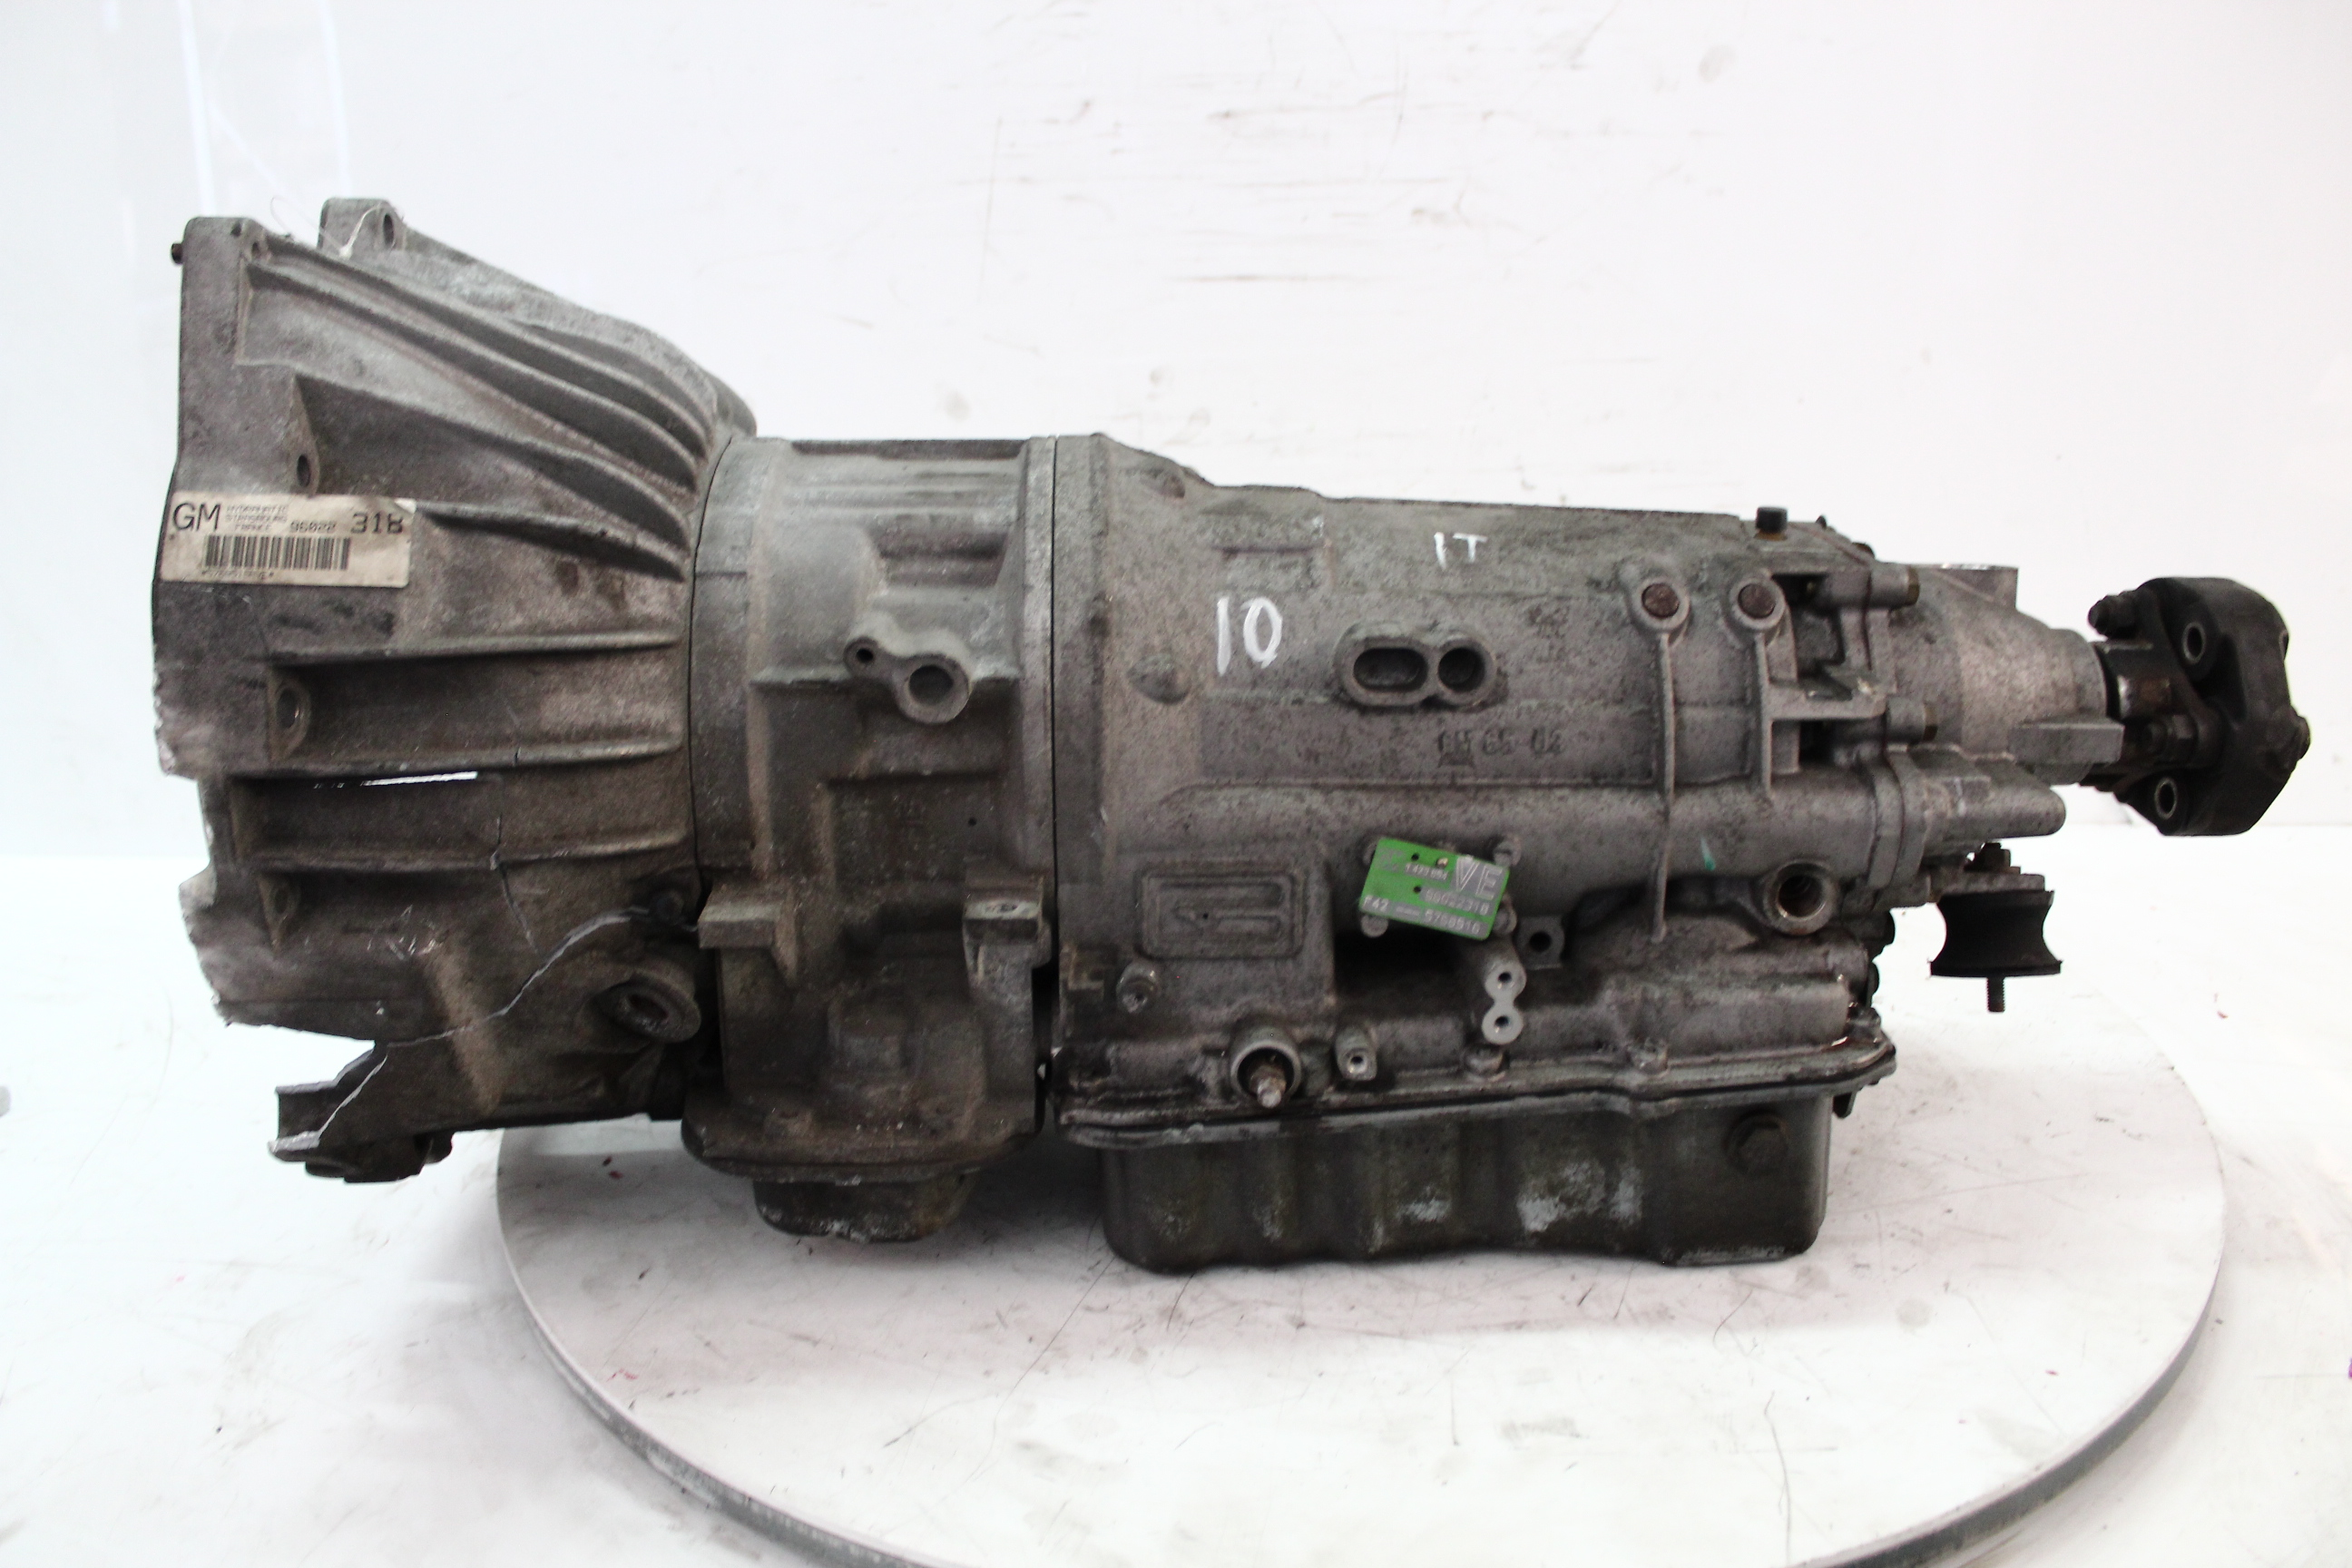 Getriebe Automatikgetriebe DEFEKT BMW 3 316i 1,9 Benzin M43B19 194E1 5766516